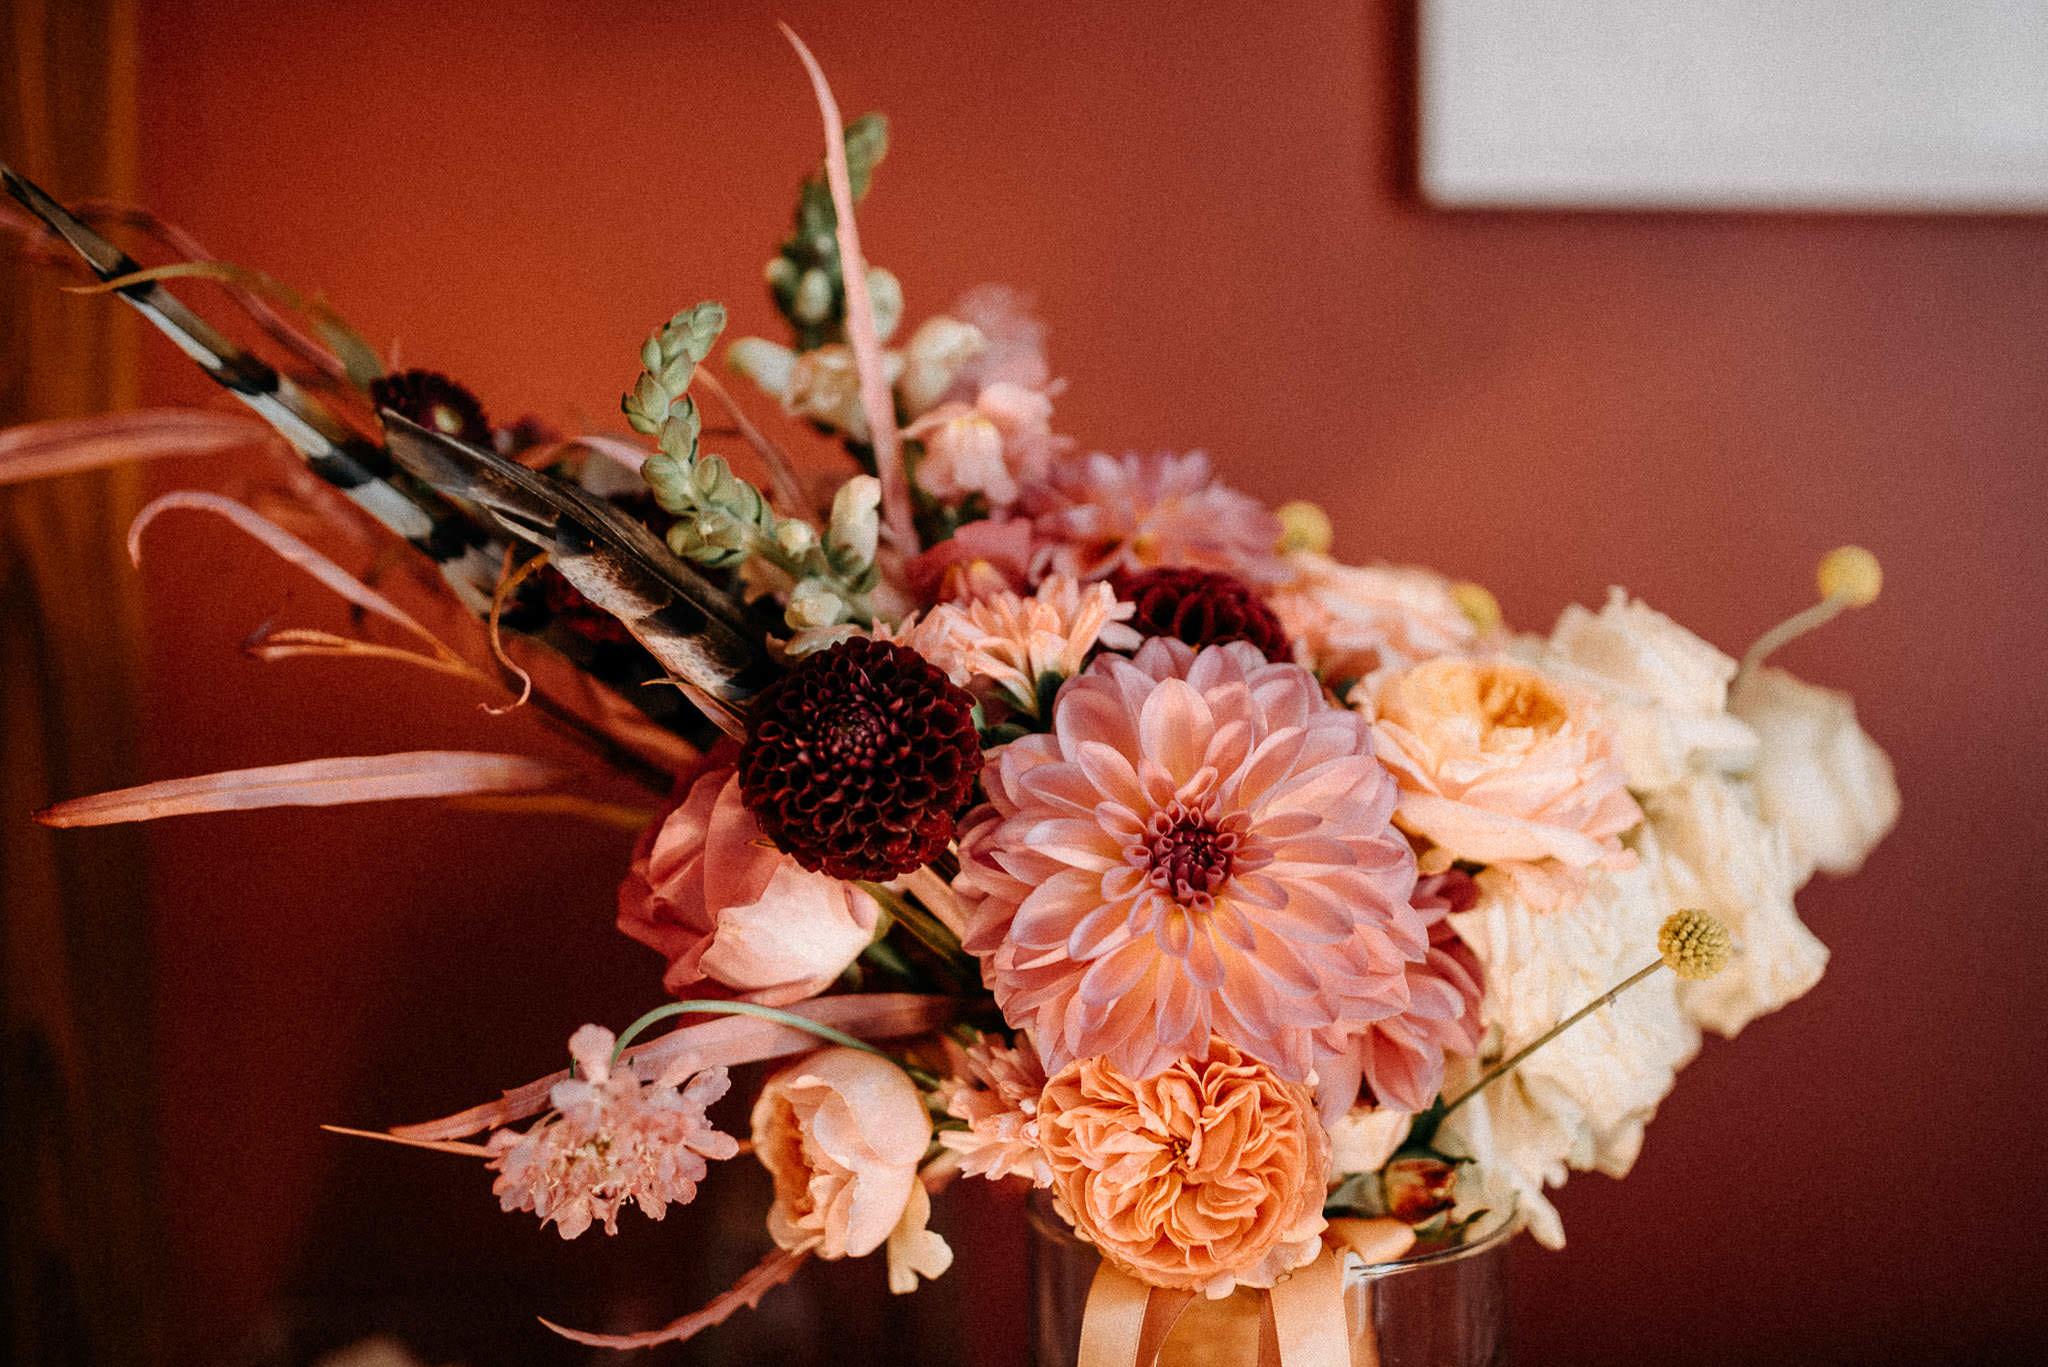 csokor bouquet eskuvodekor noritol